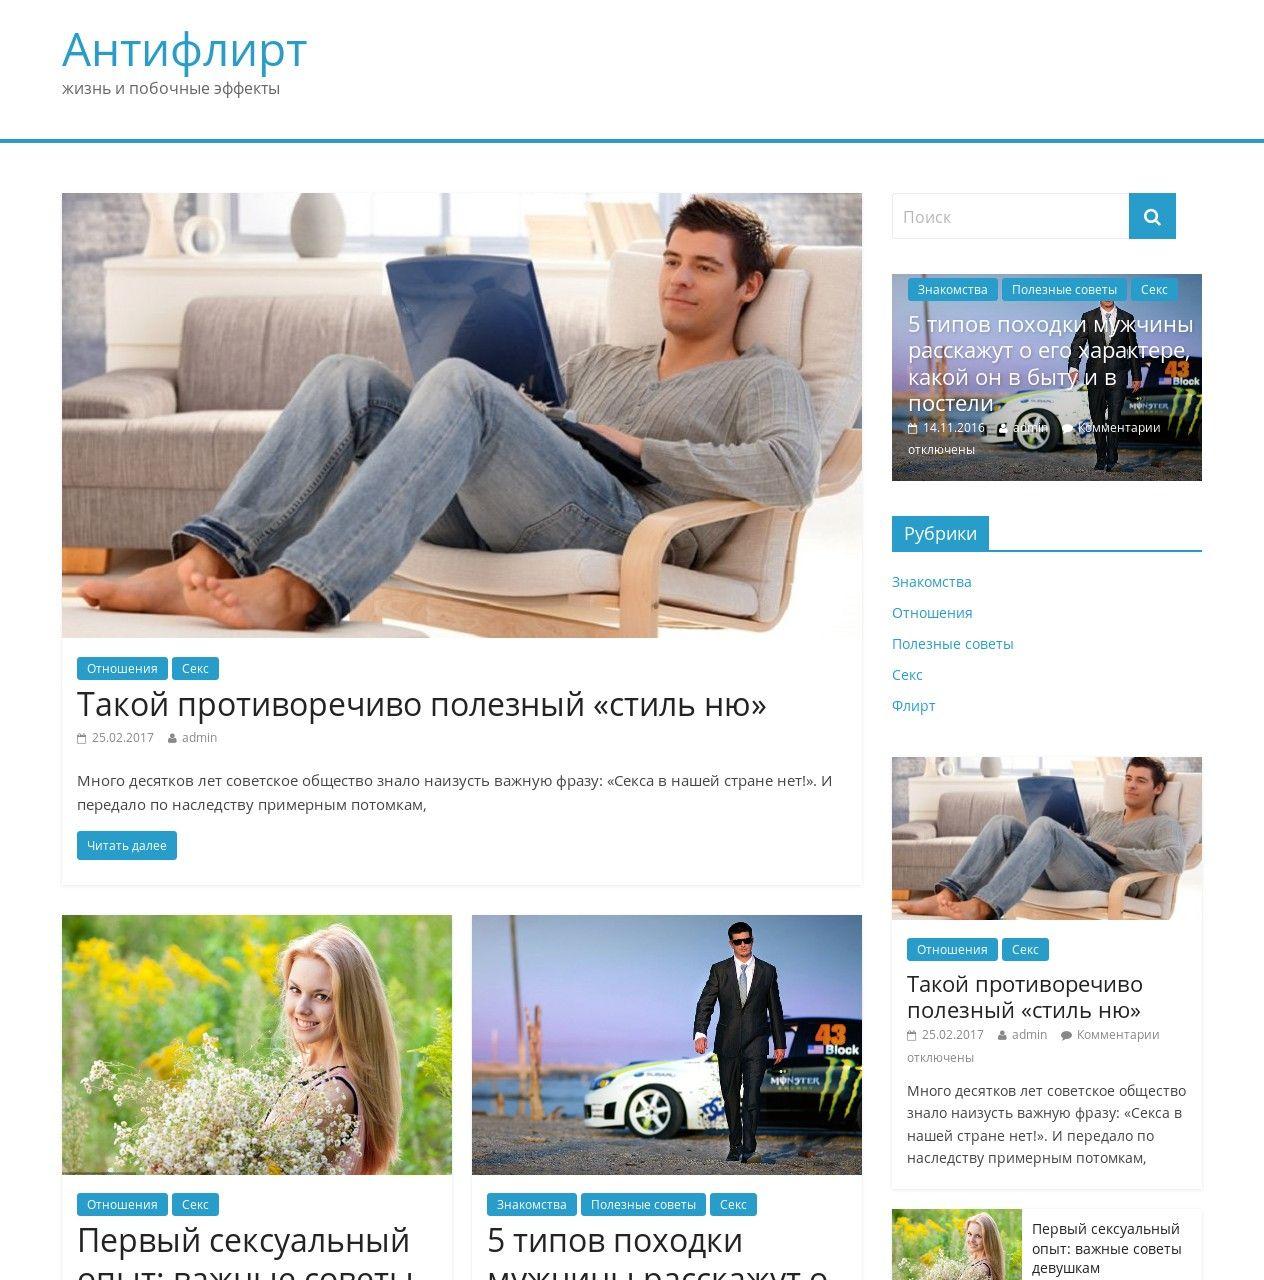 WordPress site xn--80aqalivkeo.xn--p1ai uses the ColorMag wordpress ...